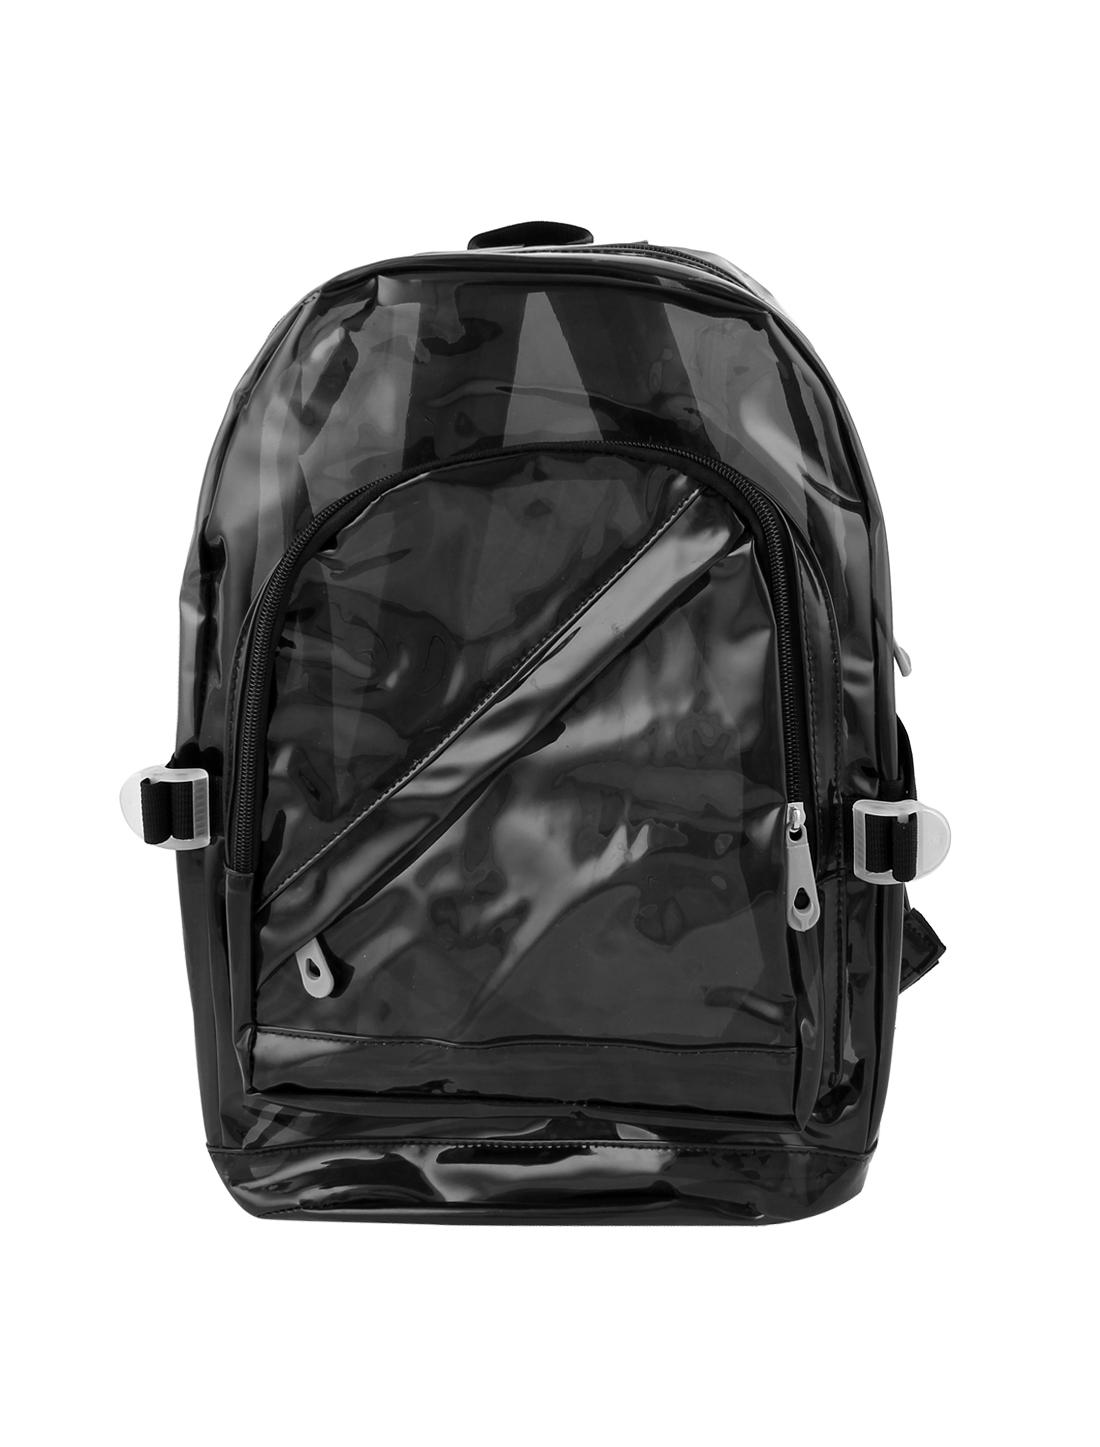 2015 New Outdoor Transparency Clear Zipper Backpack Satchel Knapsack Black